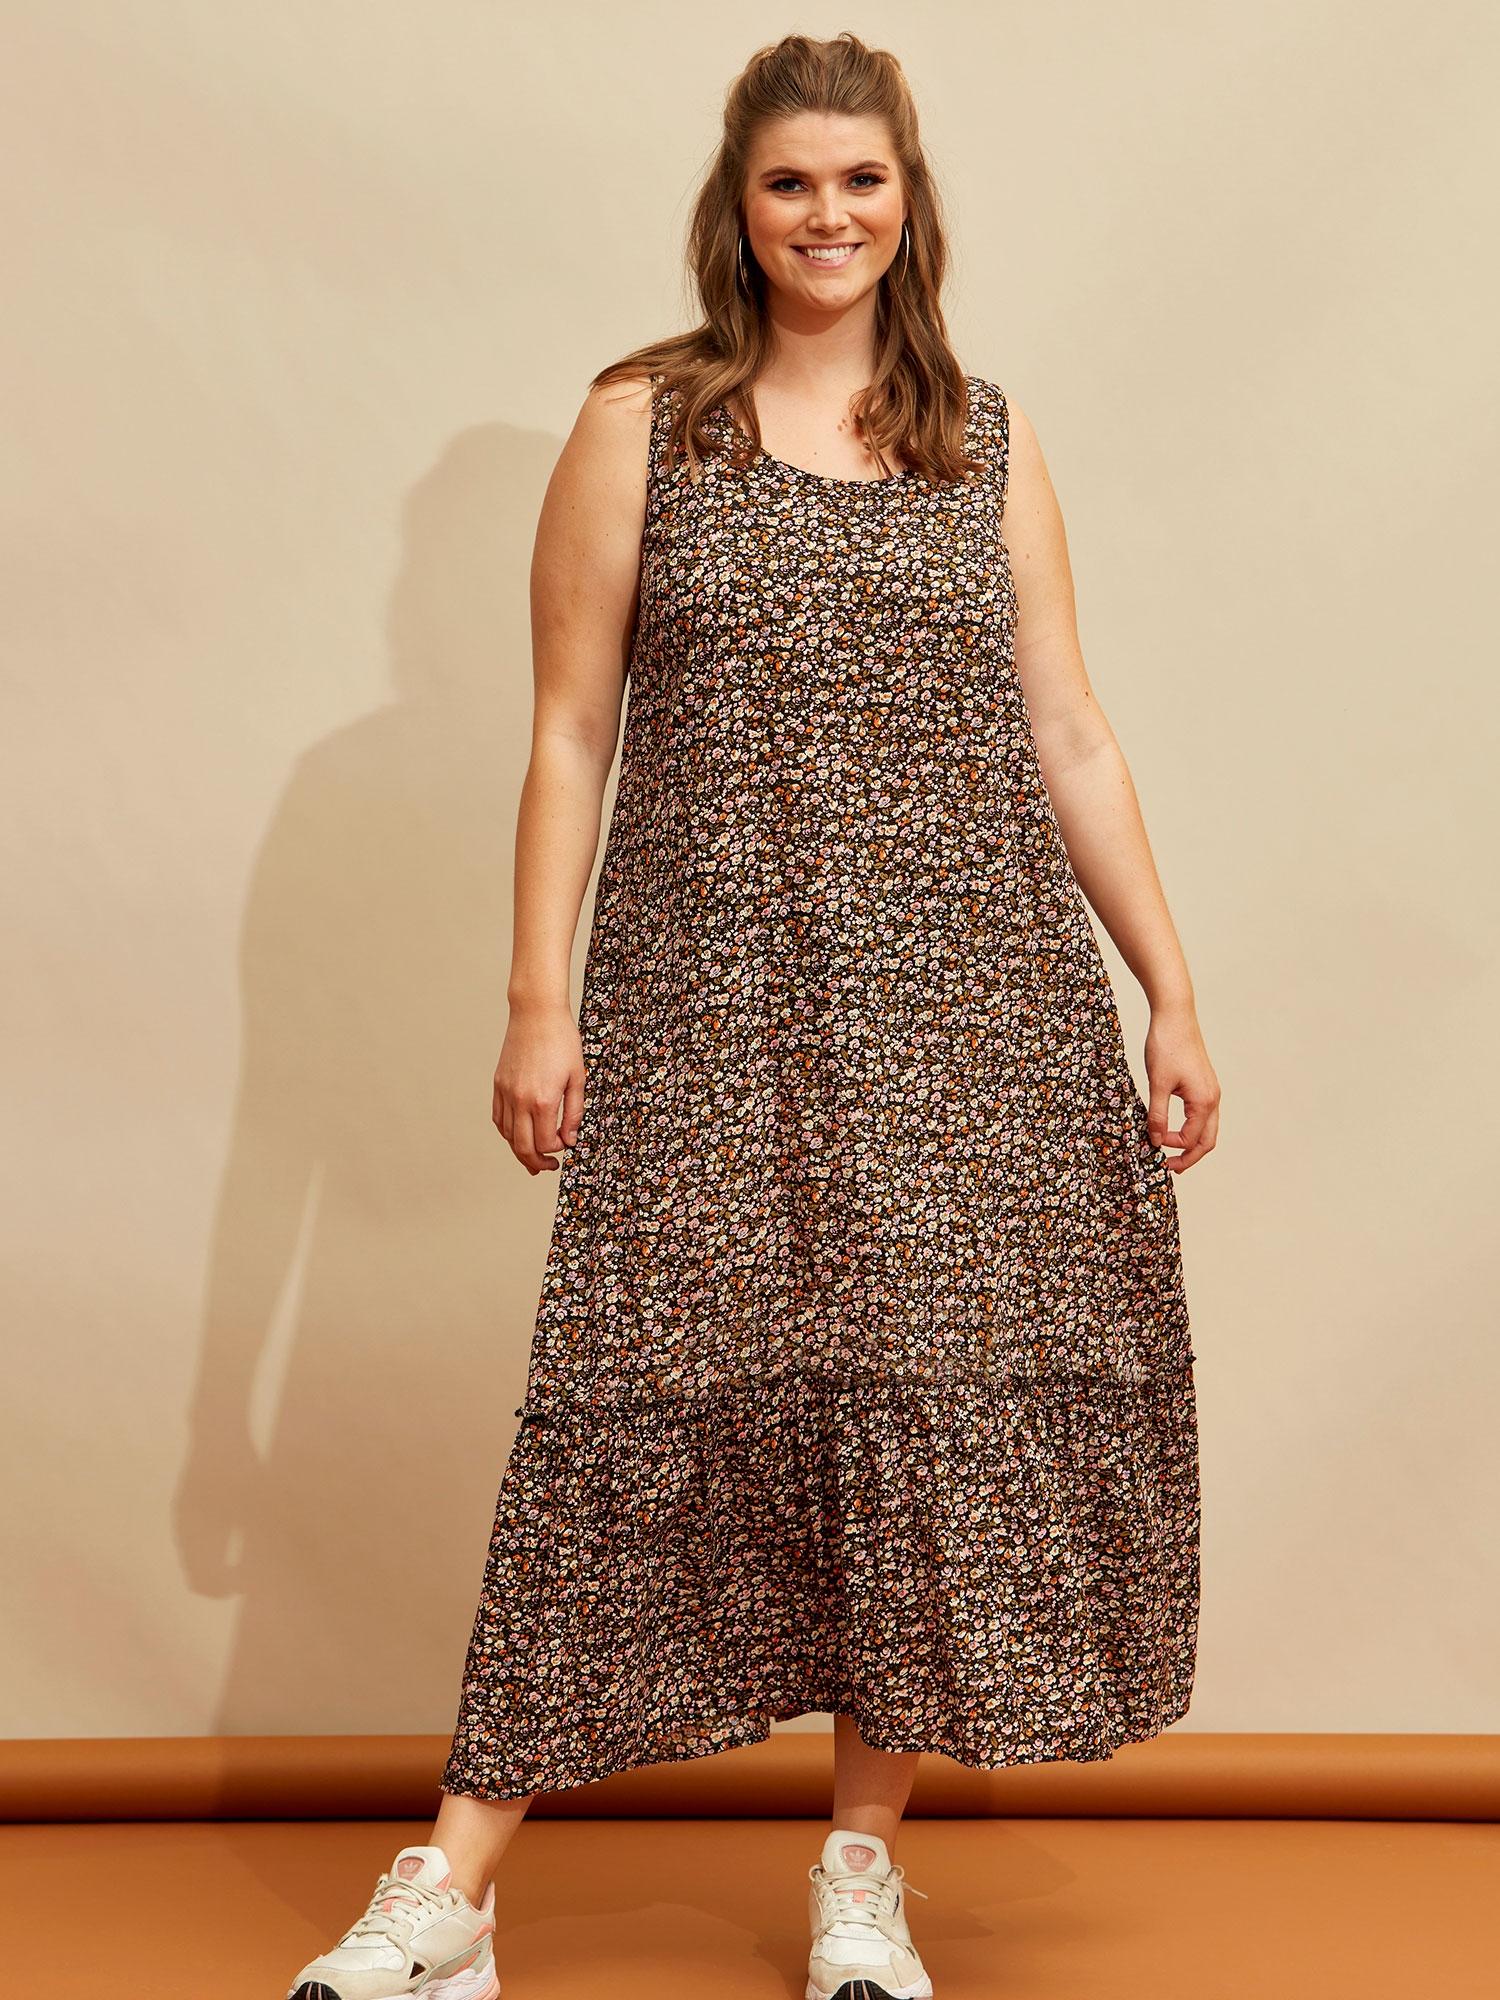 Zhenzi Smuk lang blomsteret kjole med flæse, 54-56 / XL